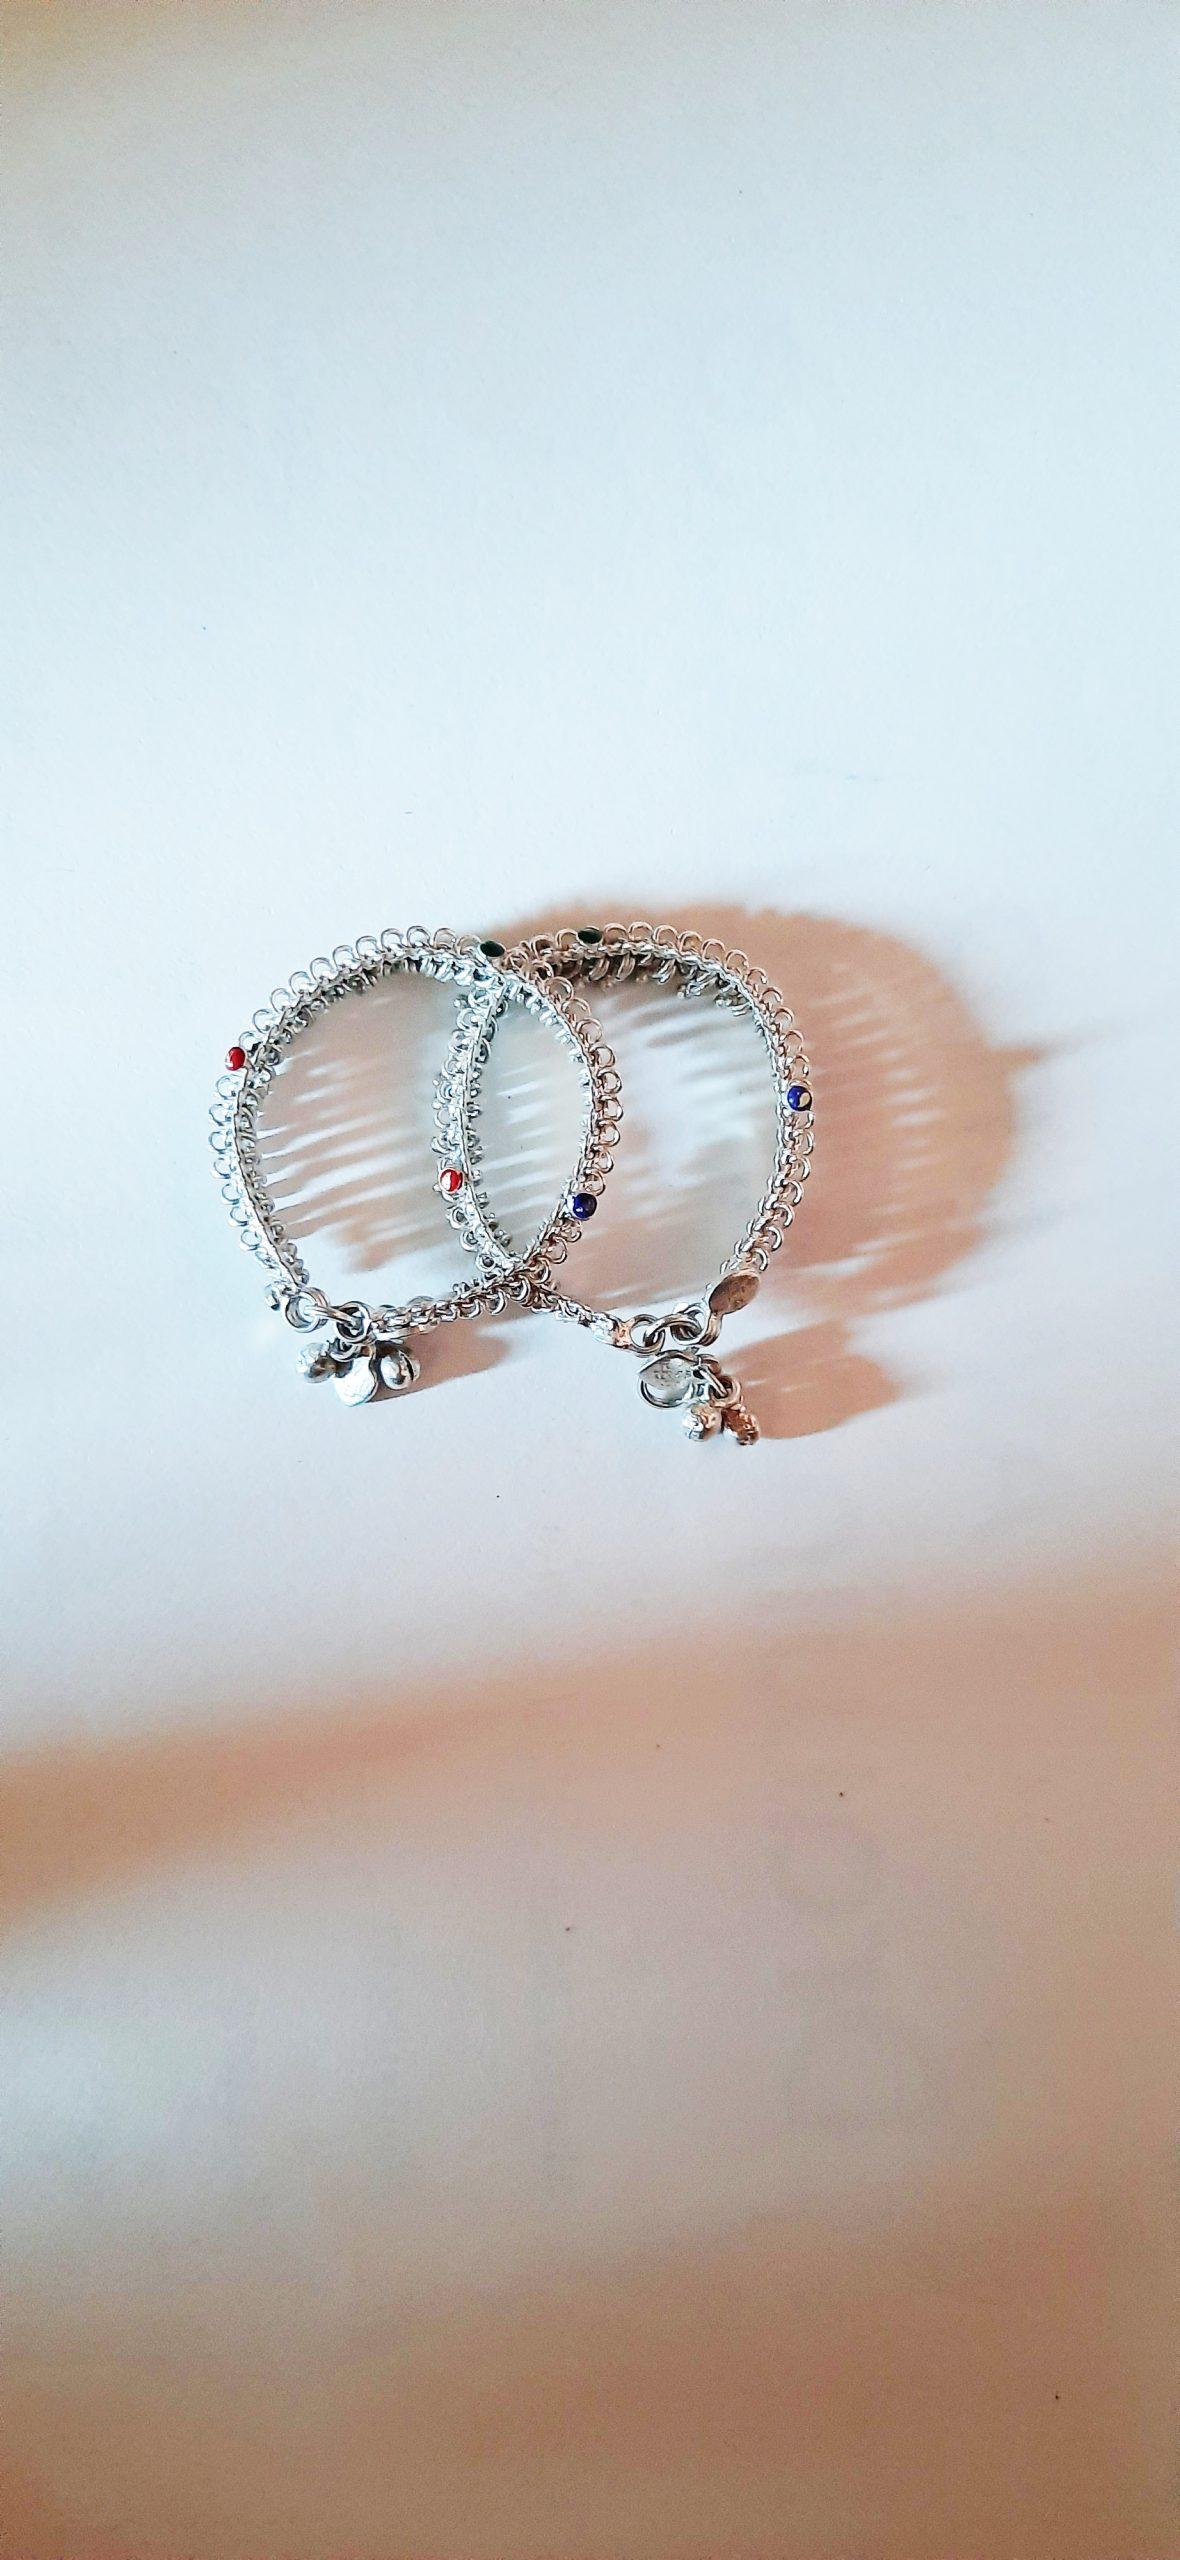 A pair of silver earrings